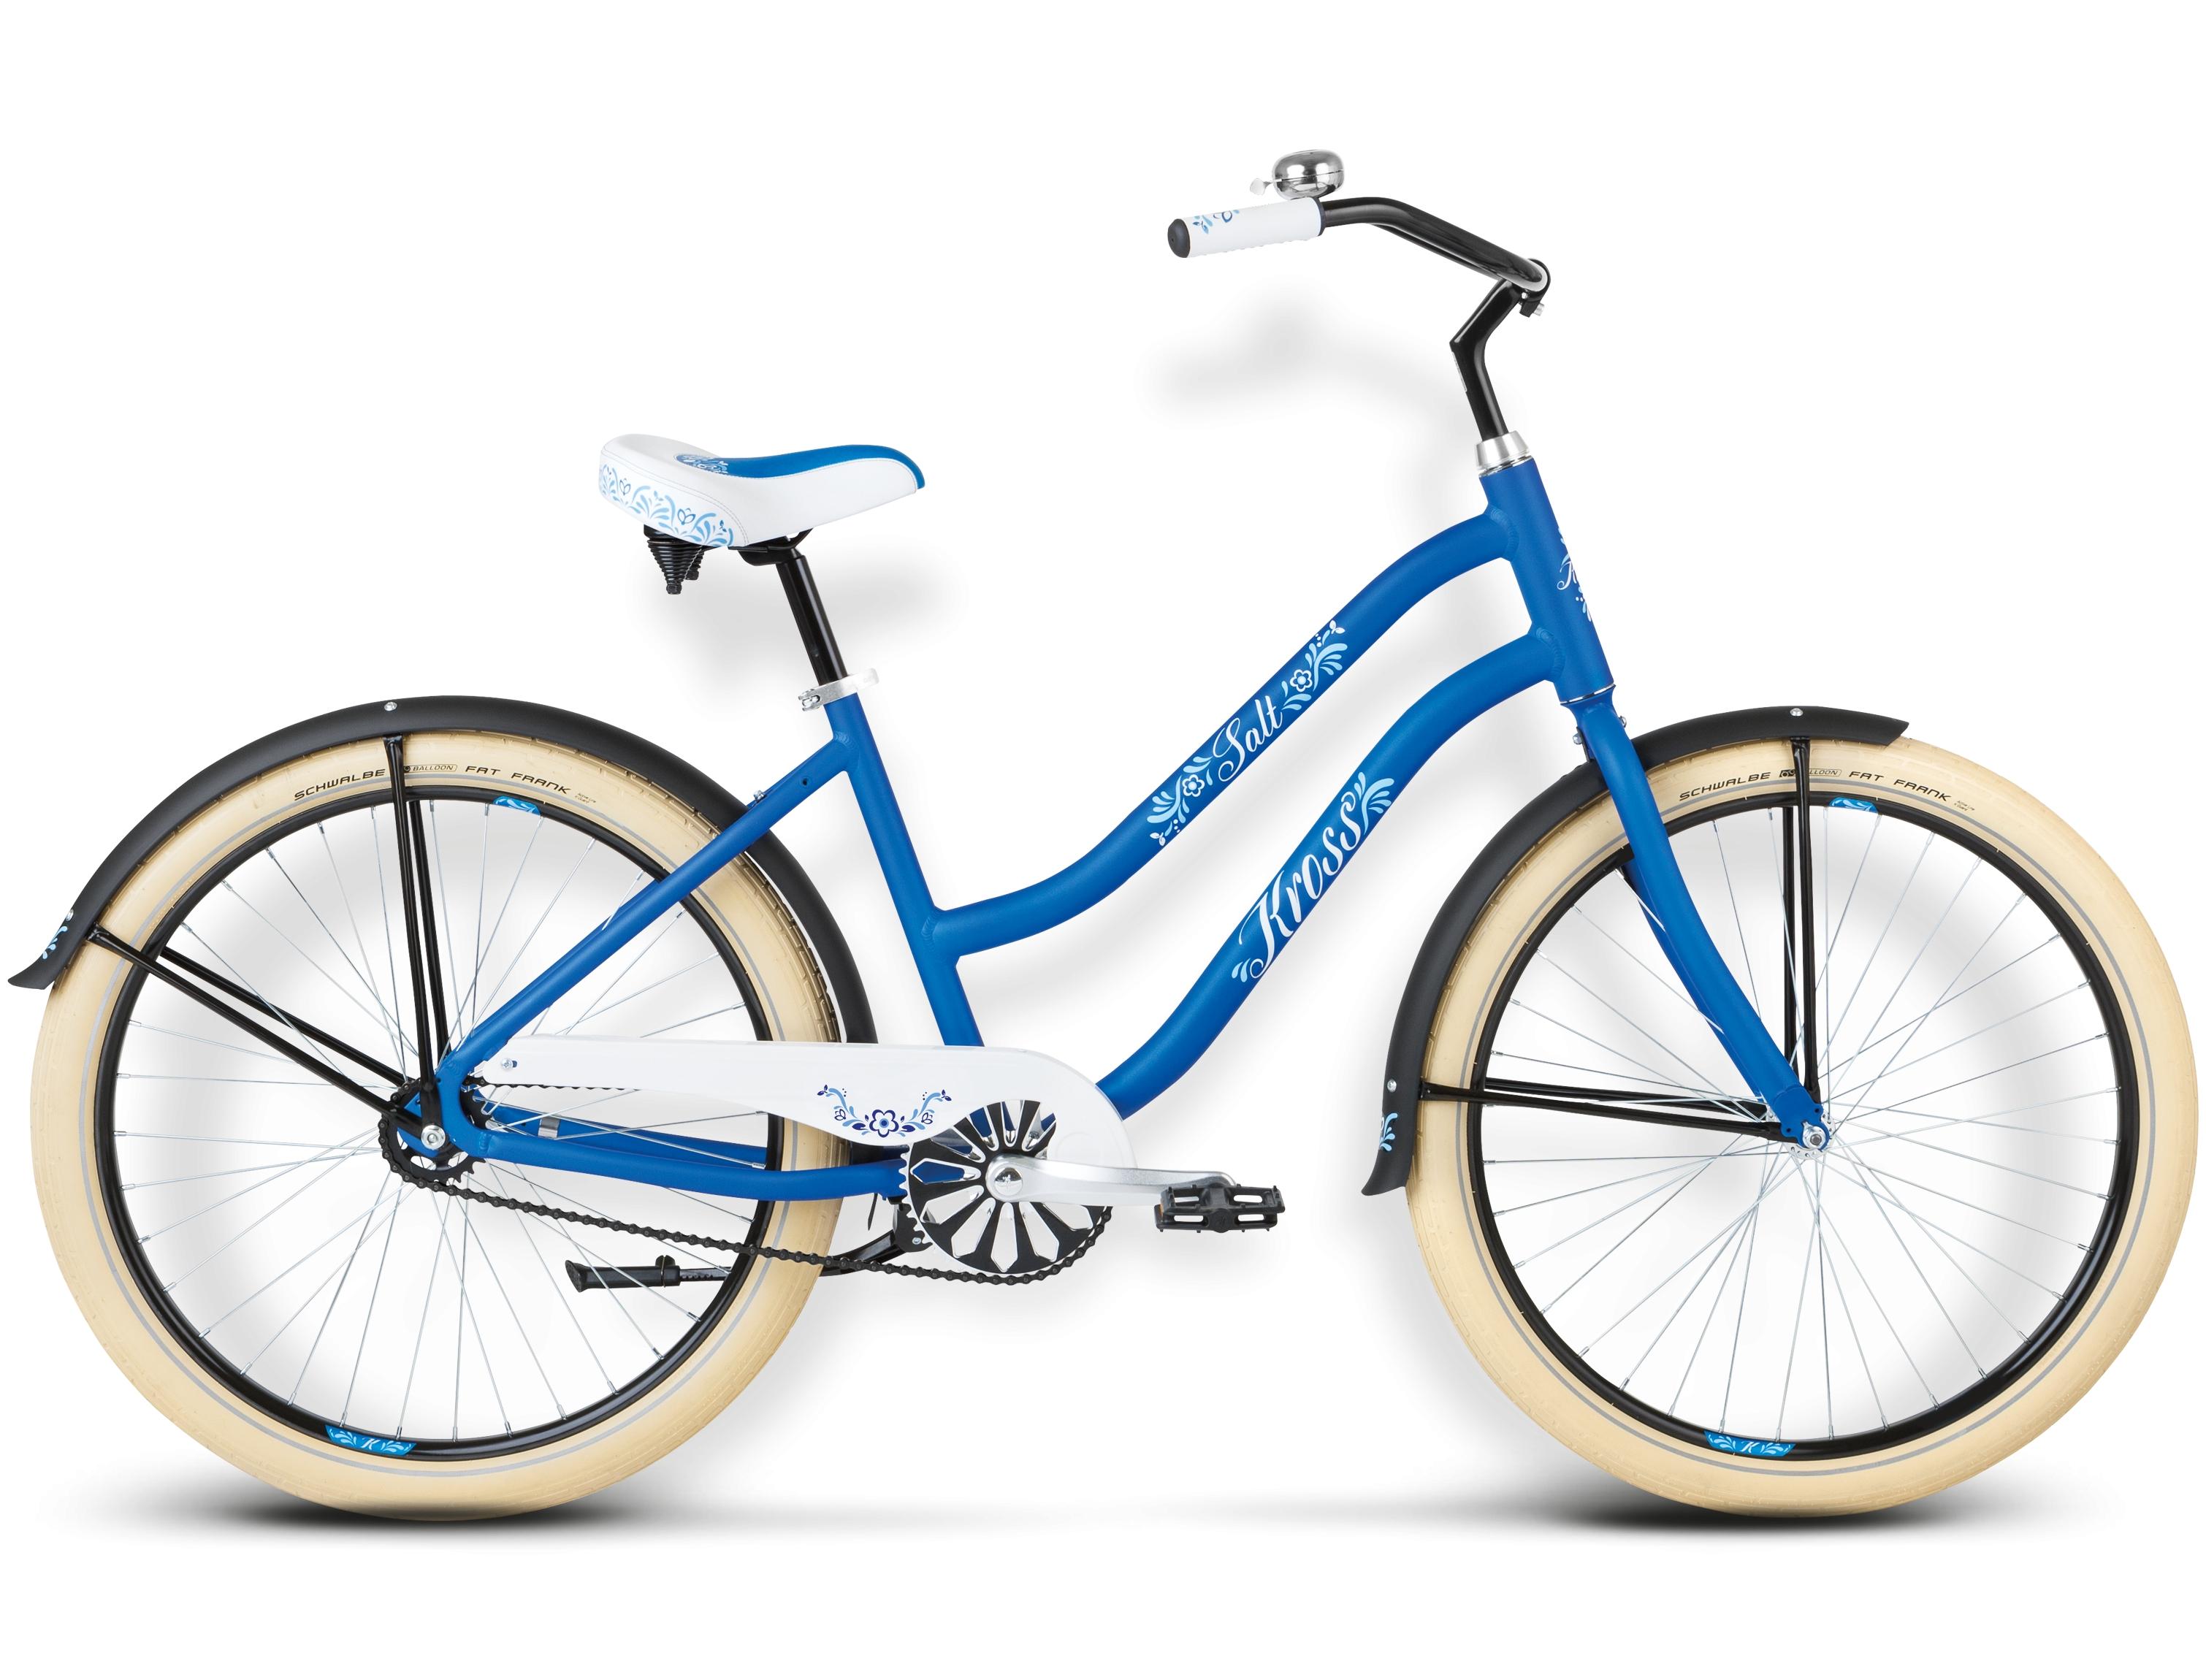 http://www.kross.pl/sites/default/files/styles/bike_zoom/public/bikes/2015/cruiser/salt_niebieski_bialy_mat.png?itok=31vOsqTT